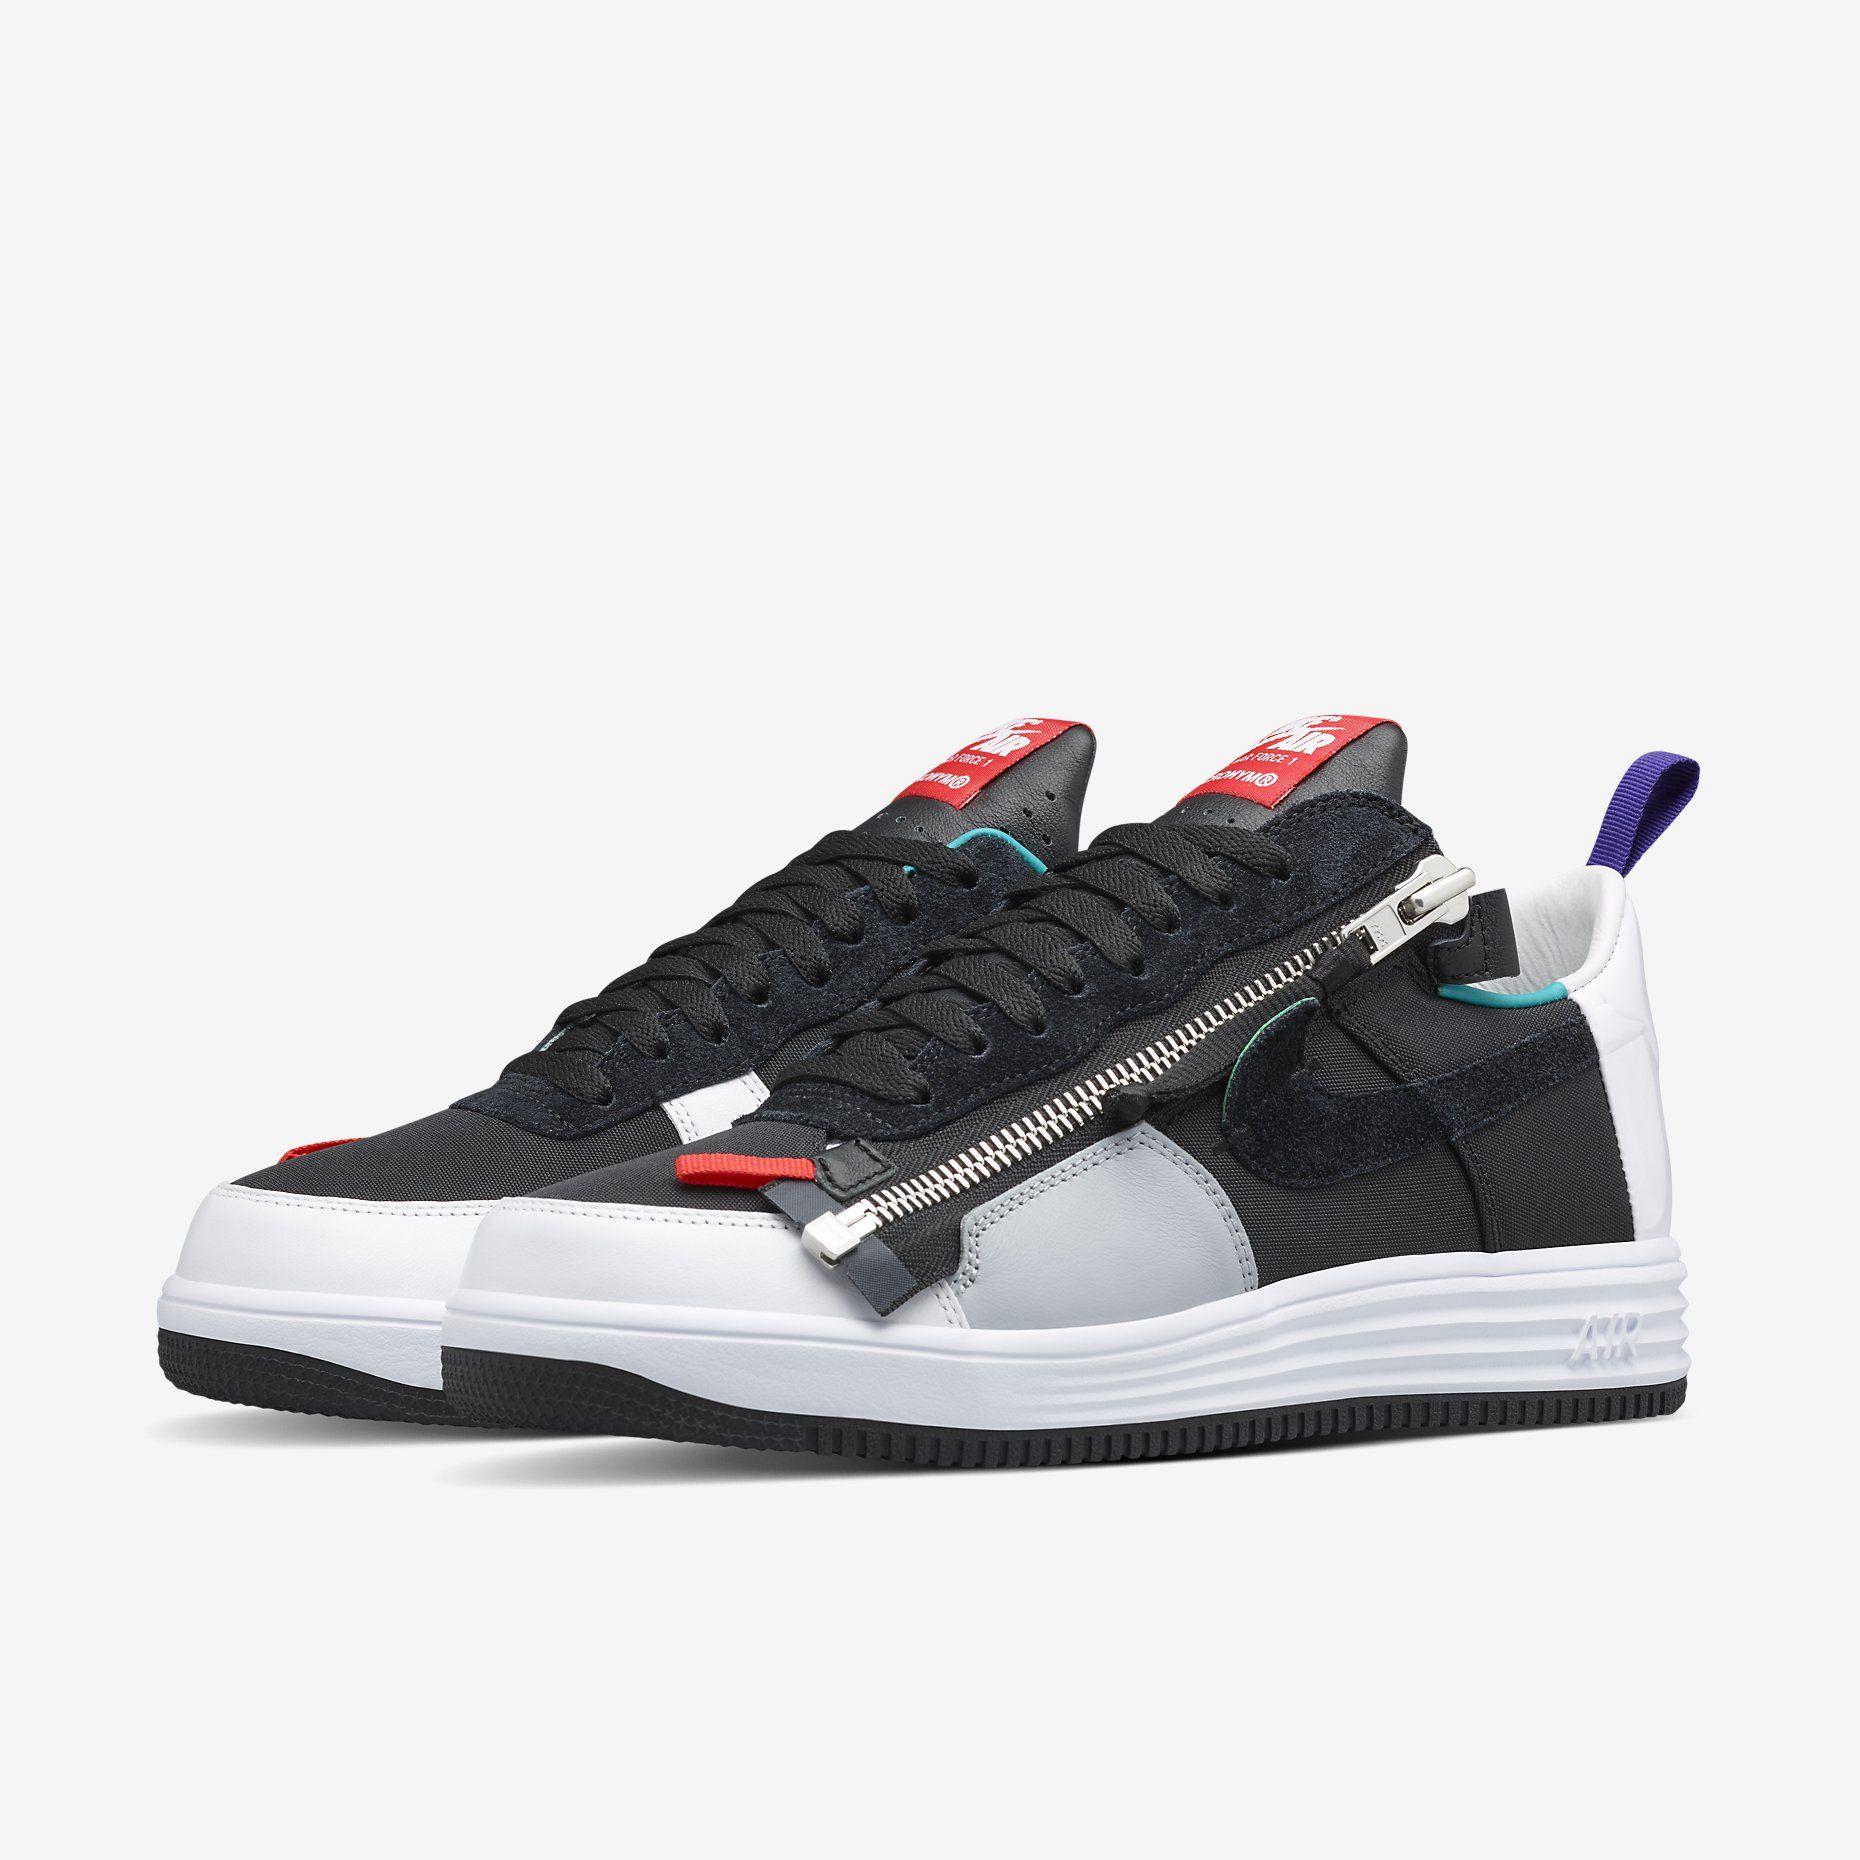 buy online f3d5b c9105 NikeLab Lunar Force 1 x Acronym Mens Shoe. Nike.com